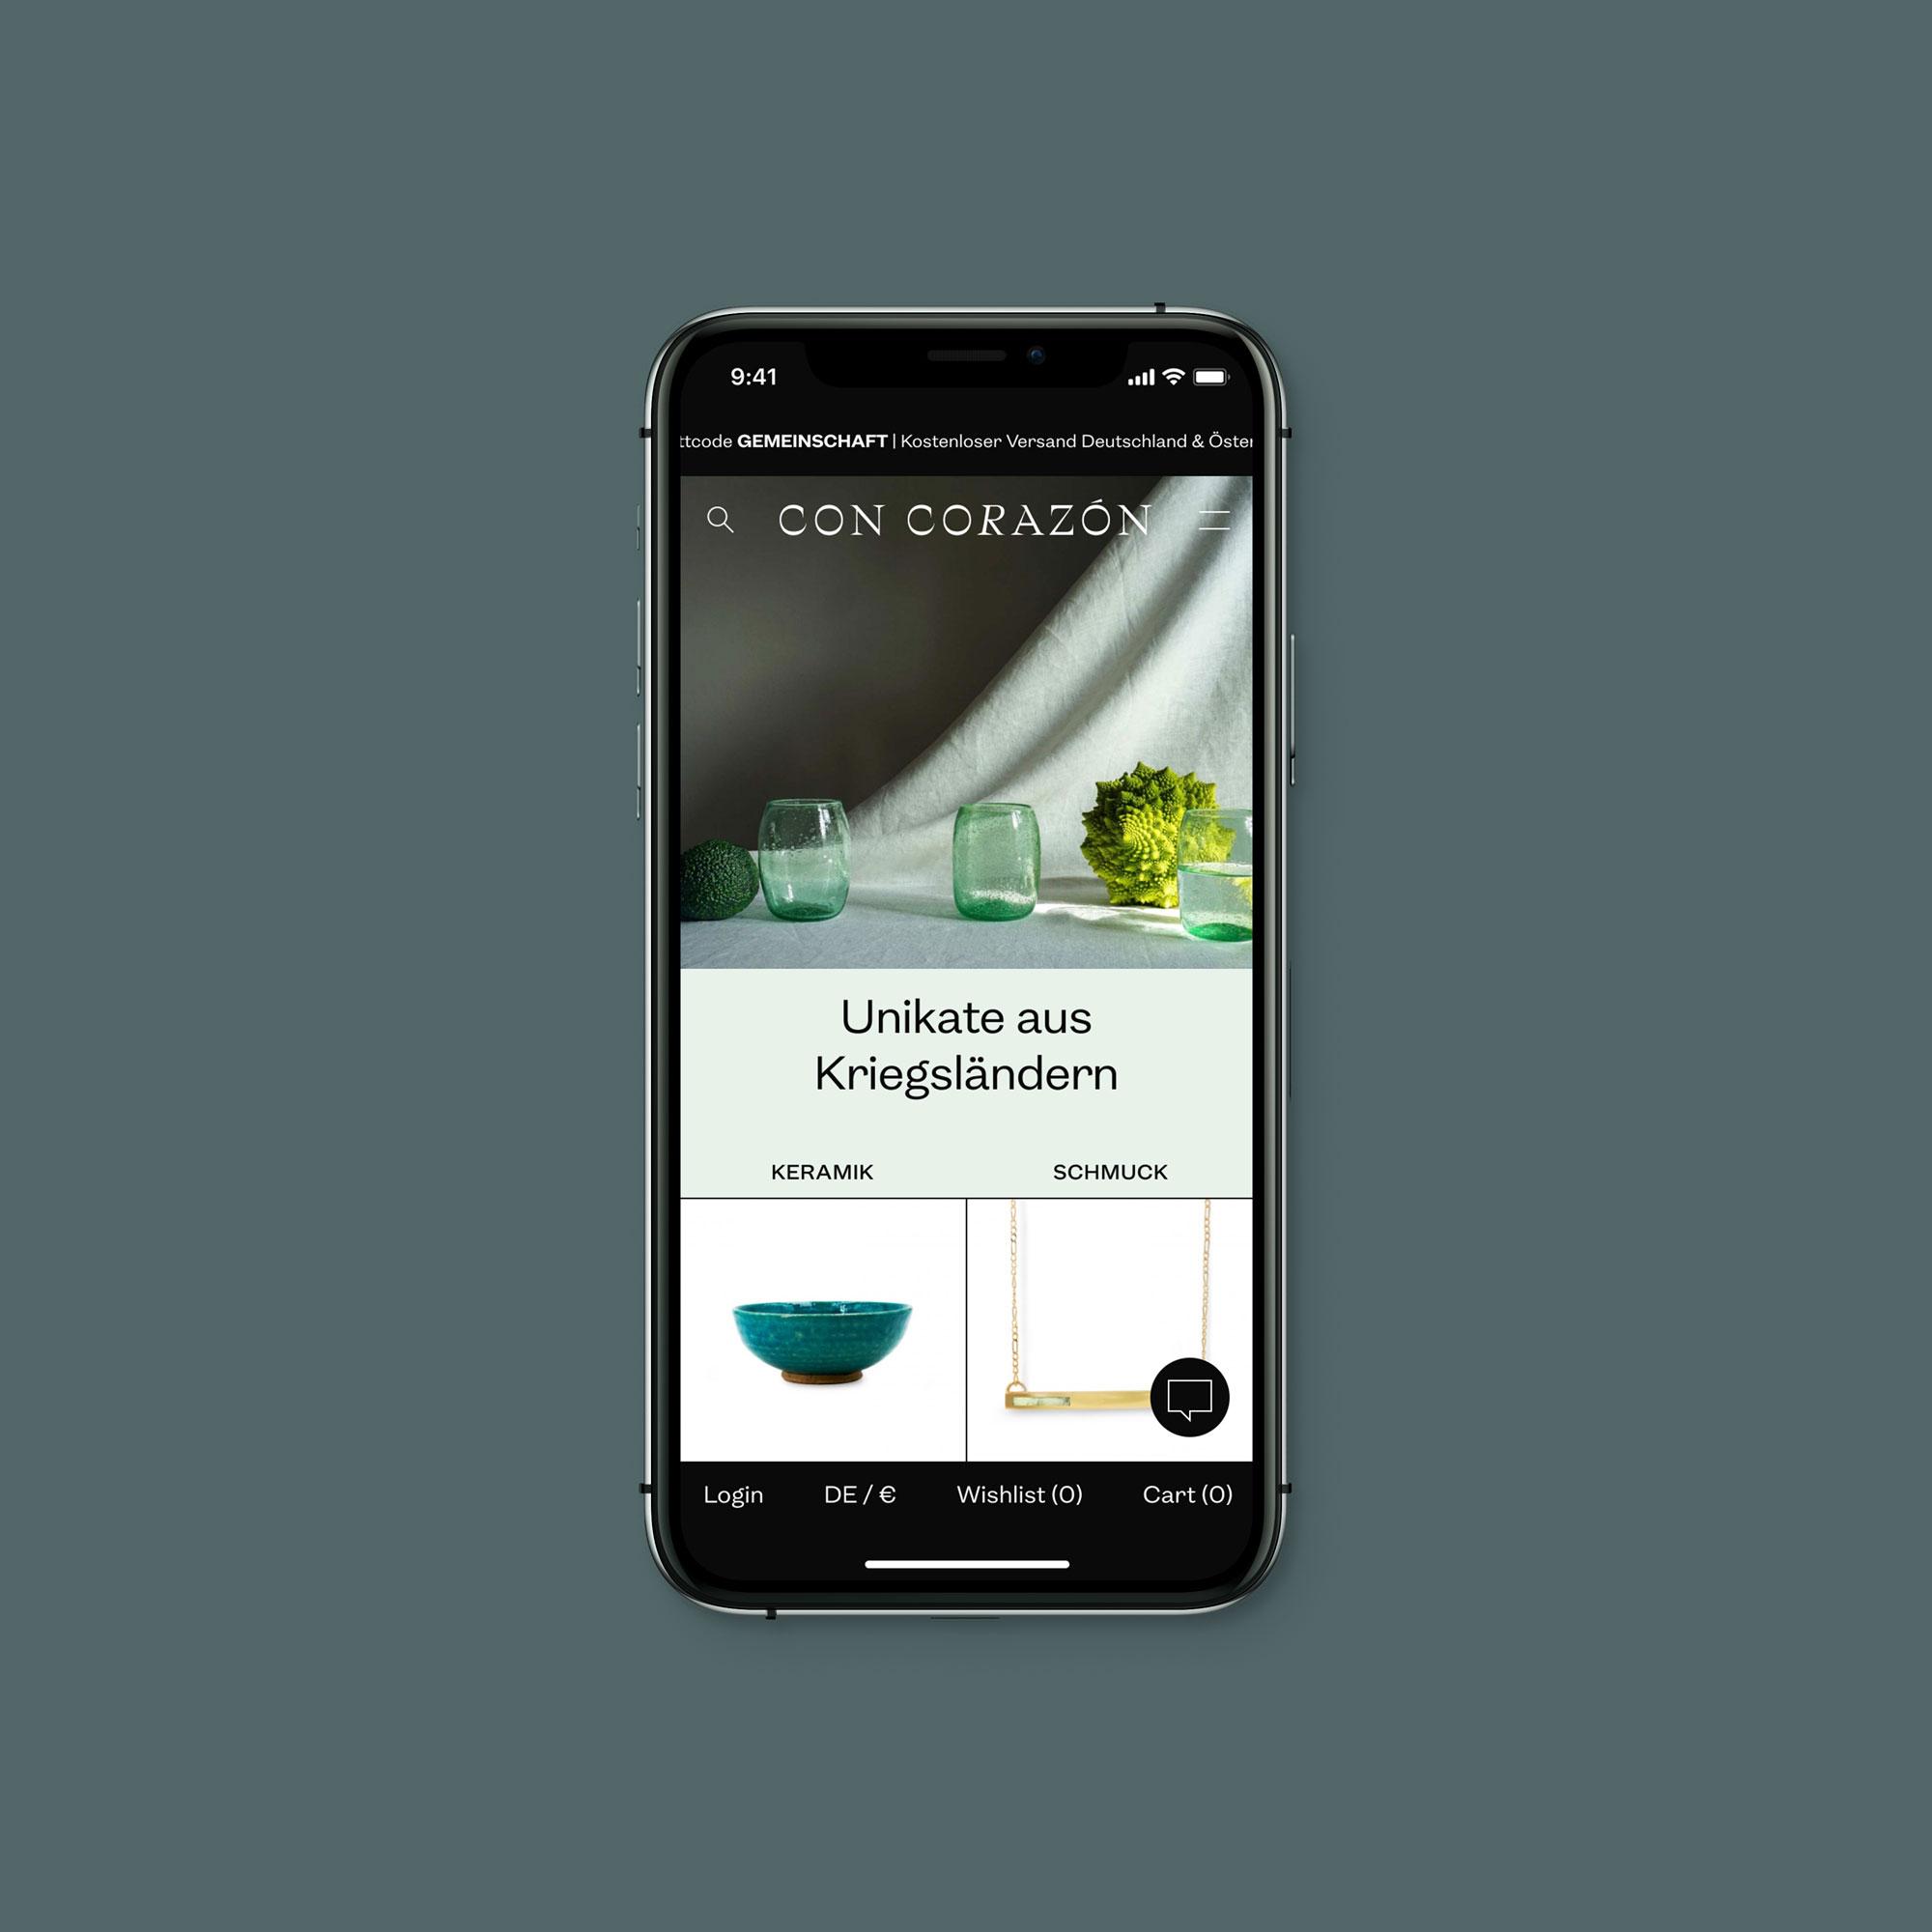 Design for an eCommerce shopping app